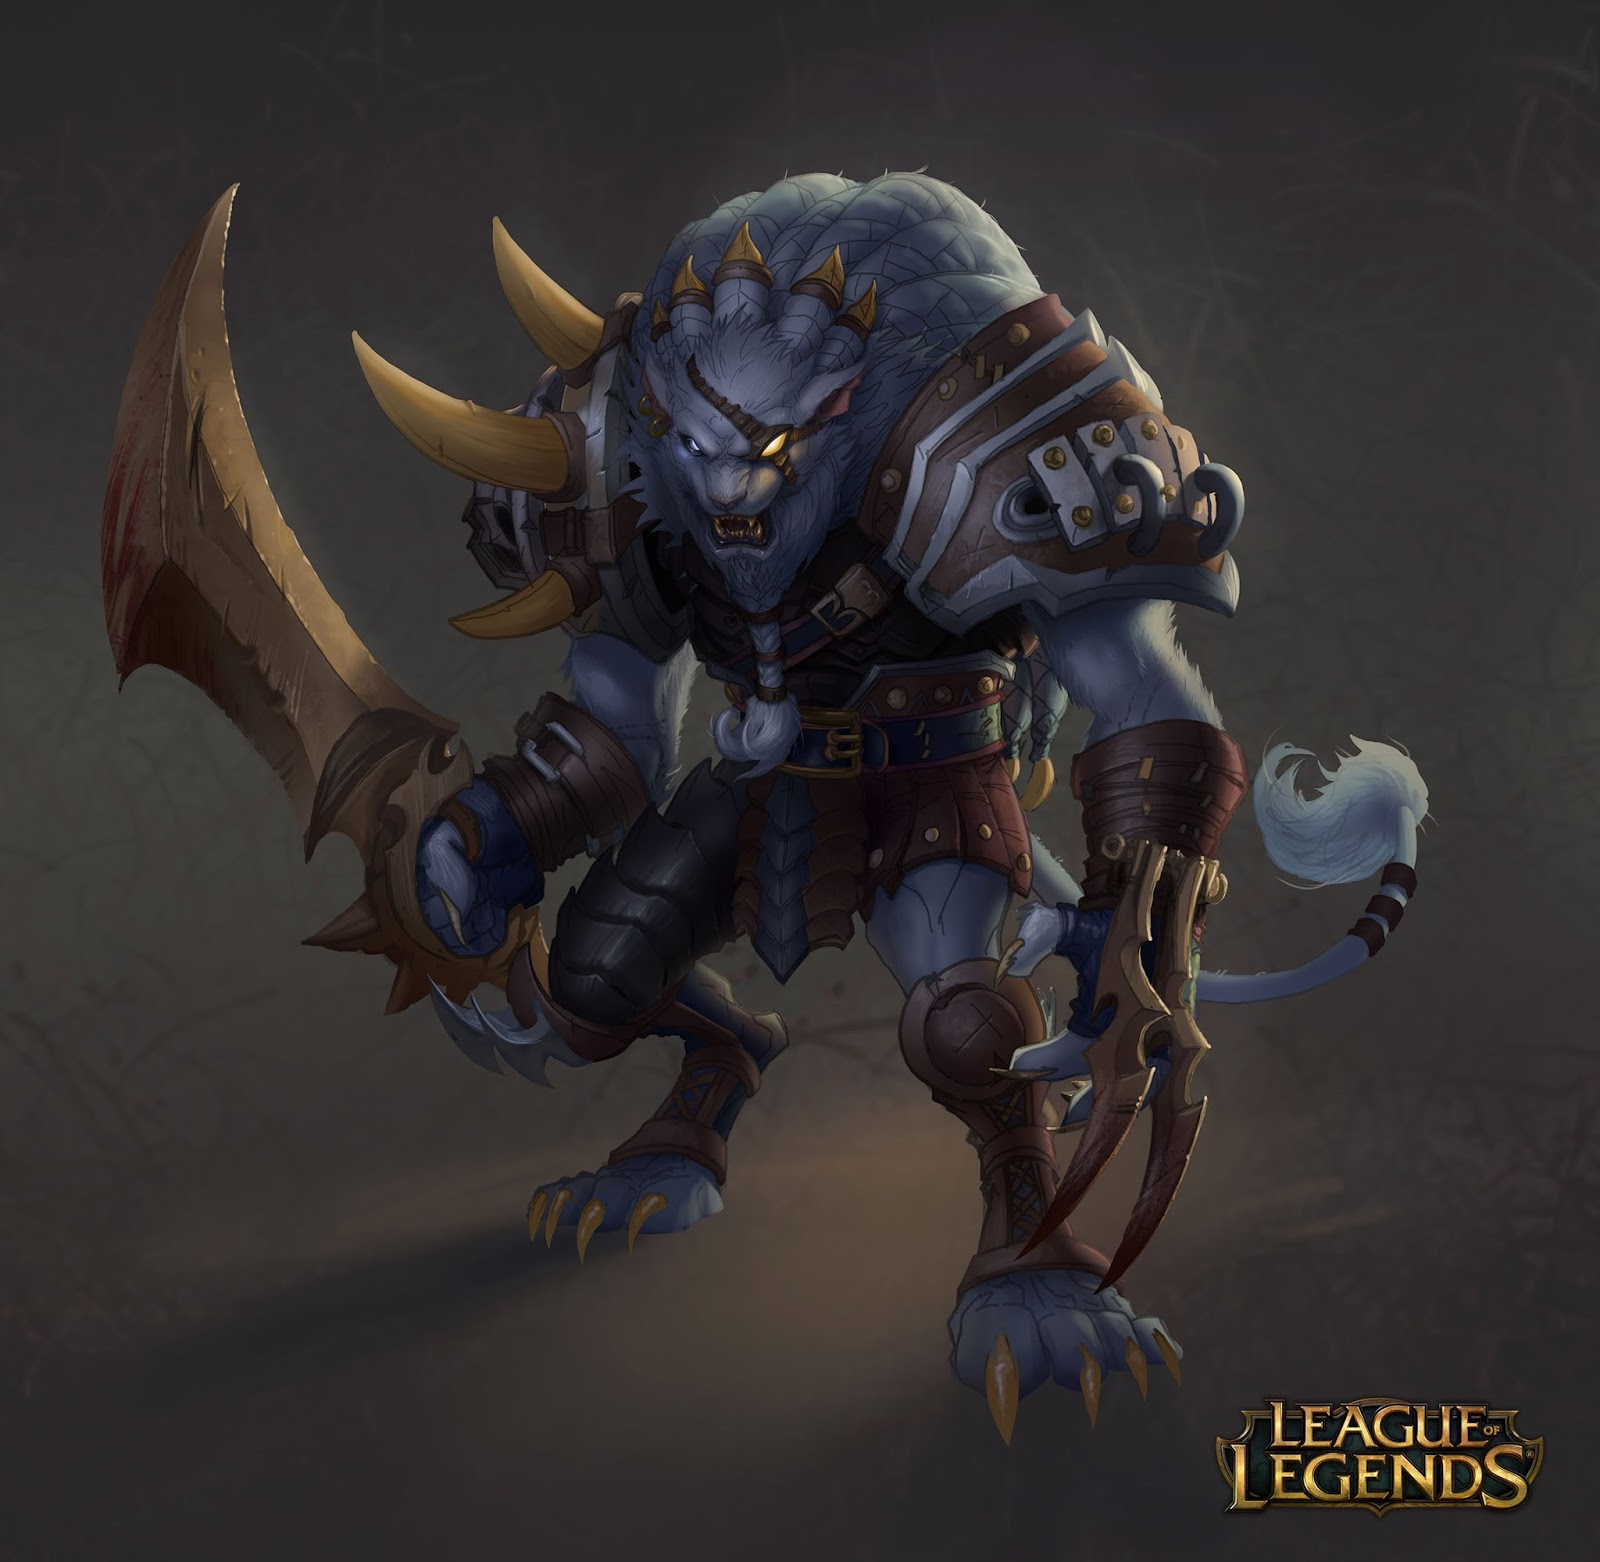 General 1600x1562 Rengar League of Legends video games fantasy art